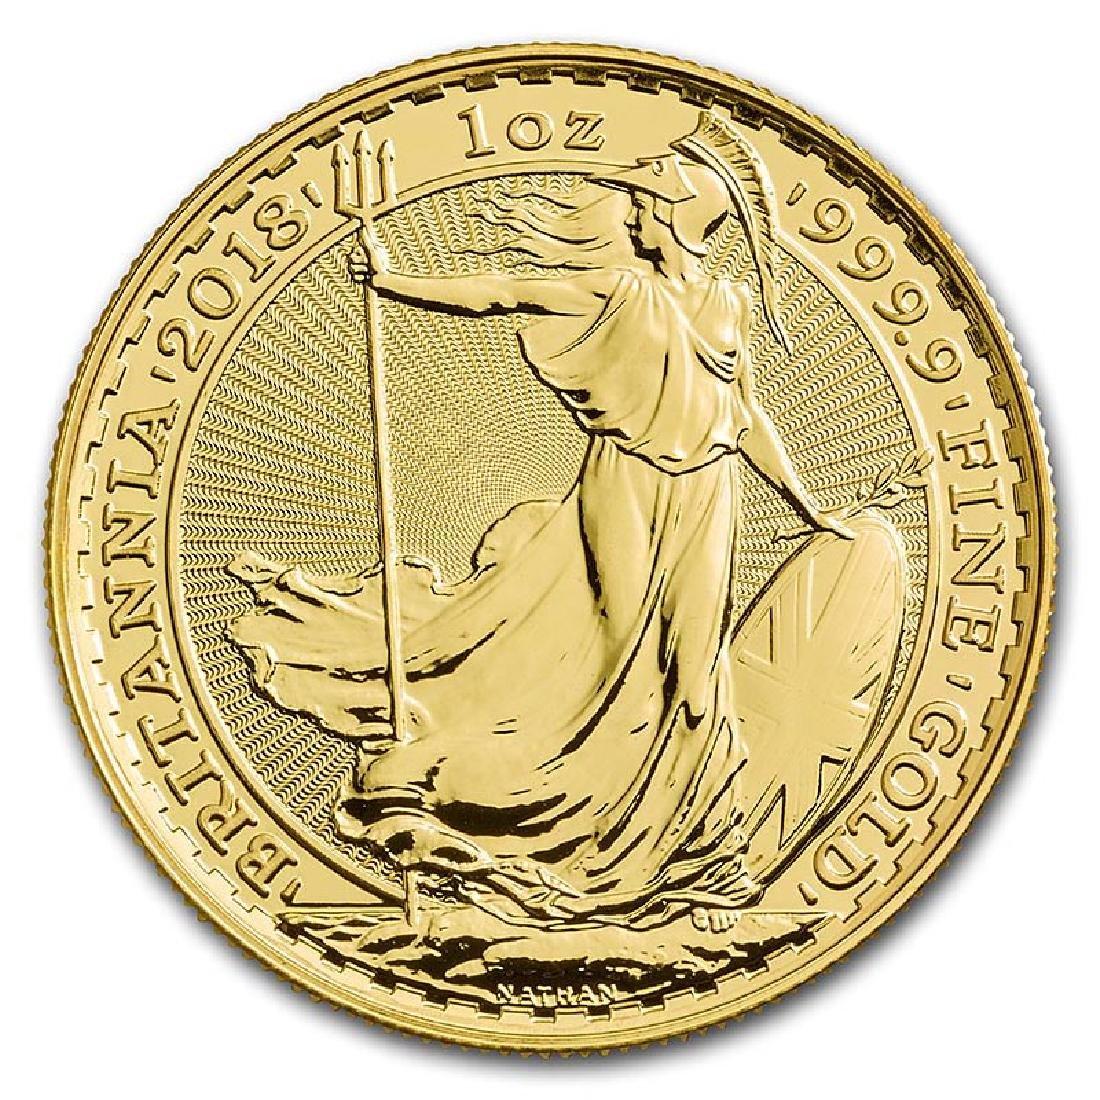 Great Britain 1 oz Gold 2018 Britannia BU